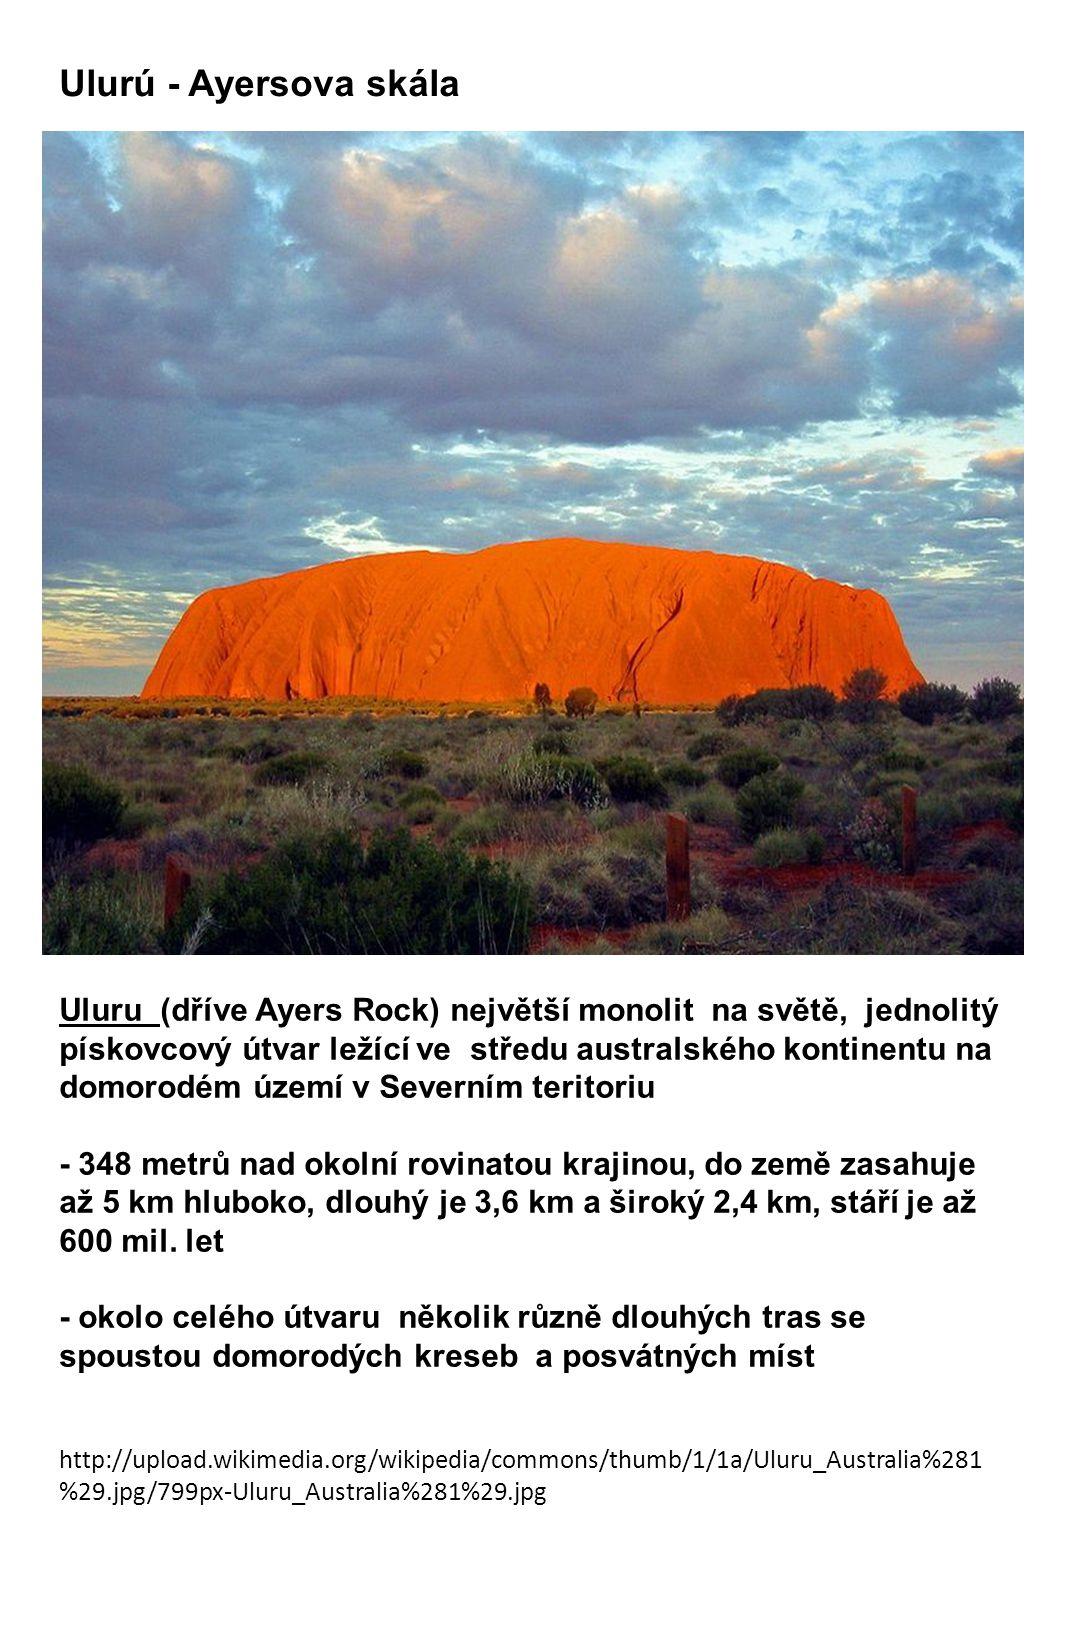 http://upload.wikimedia.org/wikipedia/commons/2/2b/Uluru2_2003-11-21.jpg pohled shoraUlurú - Ayersova skála